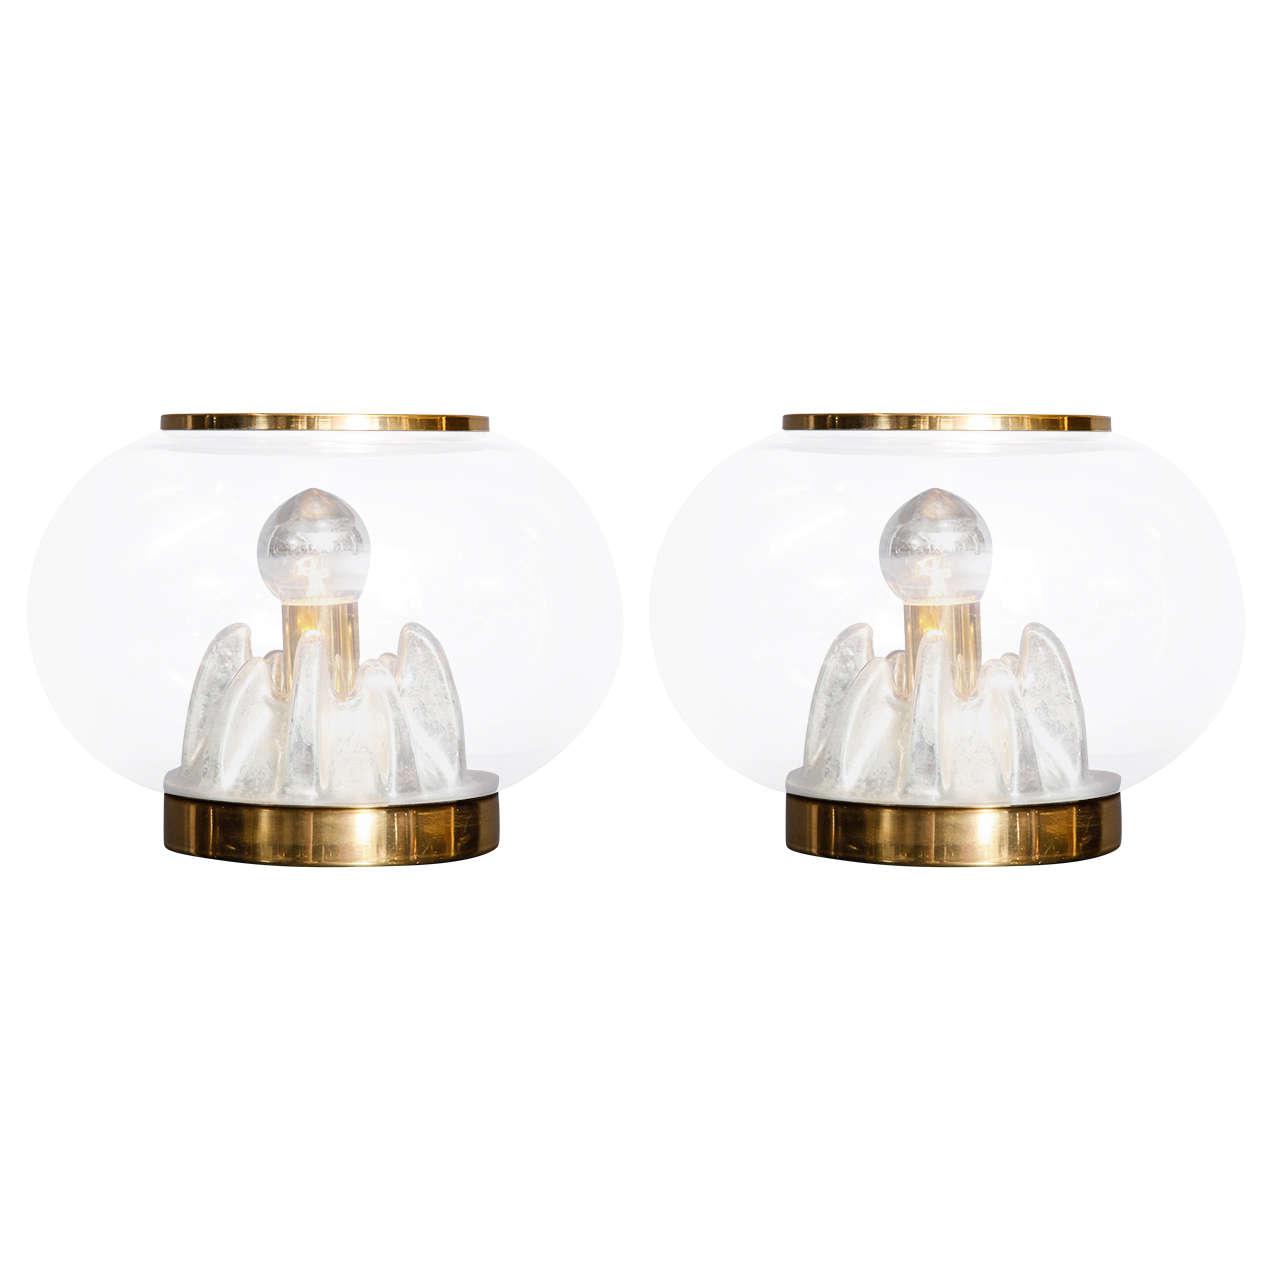 Paire de lampes Murano